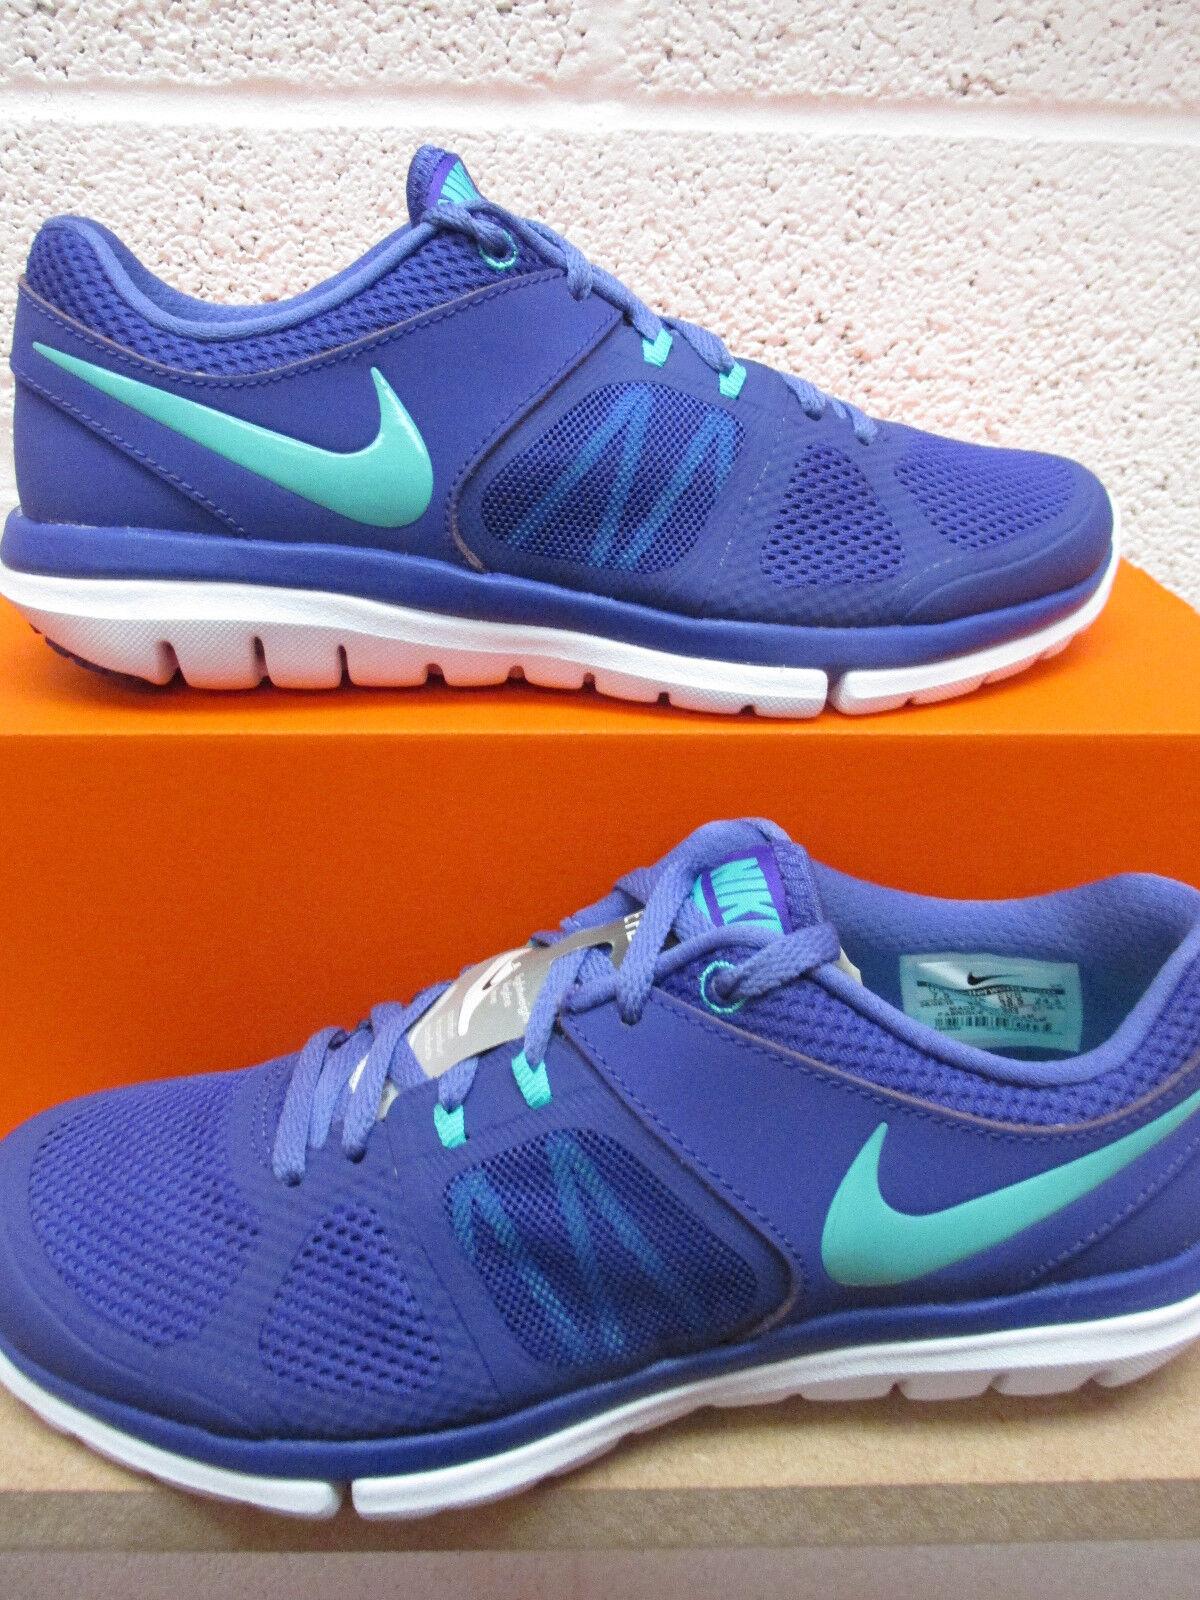 Nike Mujeres Flex 2014 Rn Zapatillas Running 642767 503 Zapatillas Cheap and beautiful fashion